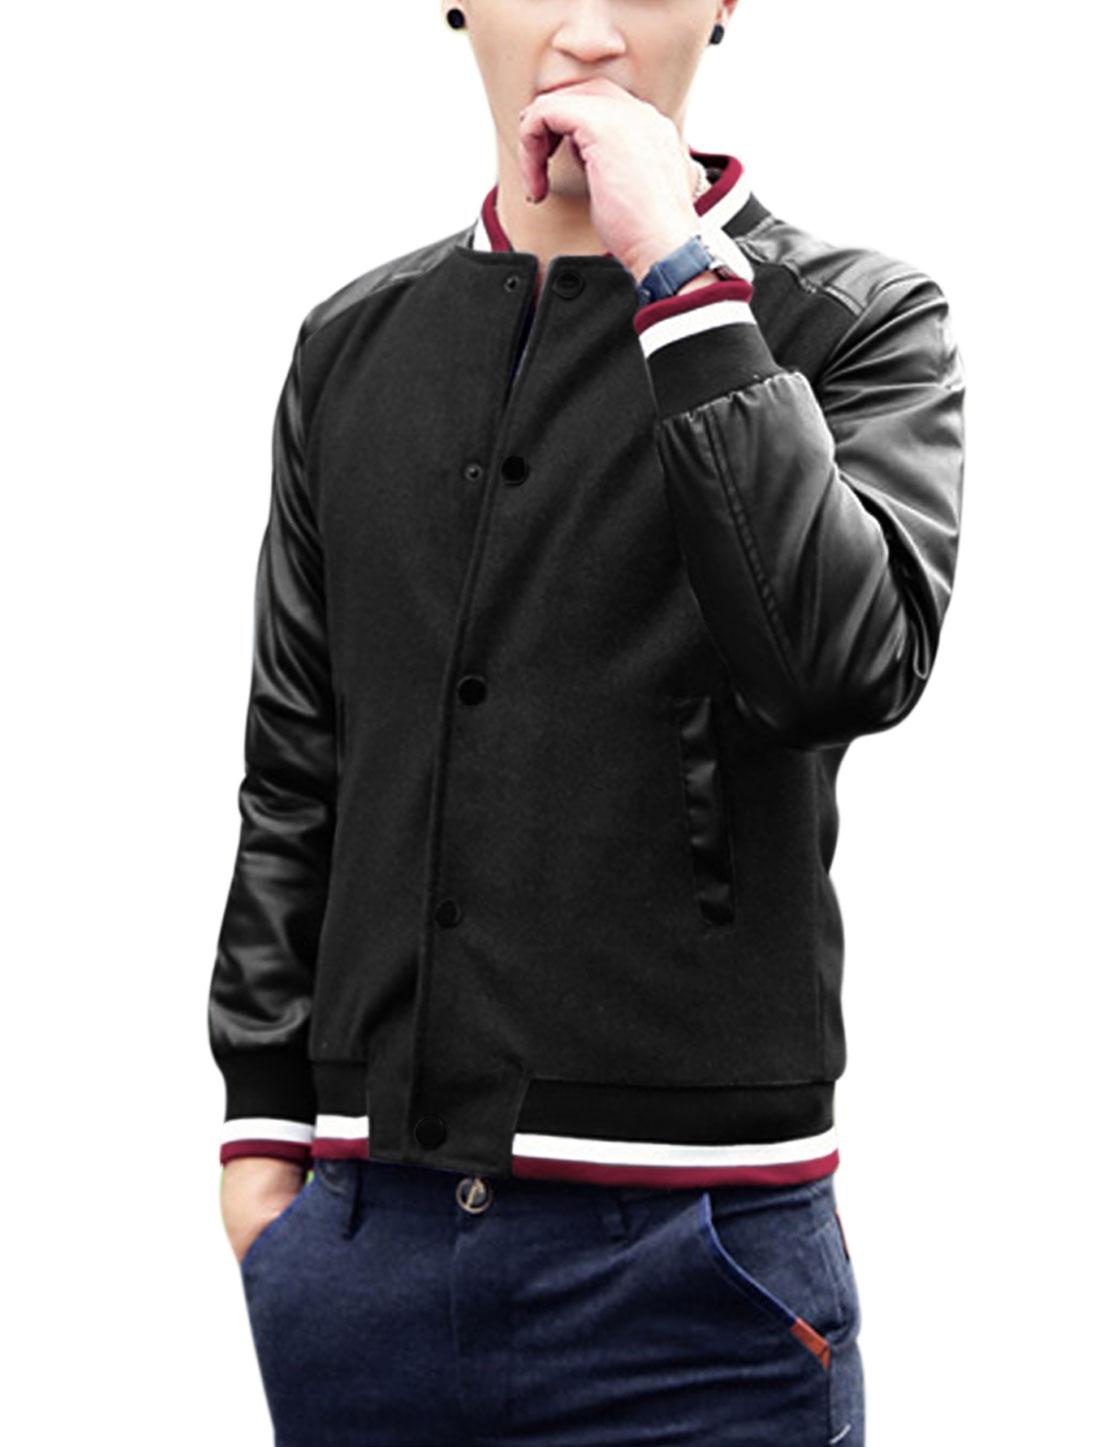 Man Rib Knit Collar Long Imitation Leather Sleeves Fashion Jacket Black M